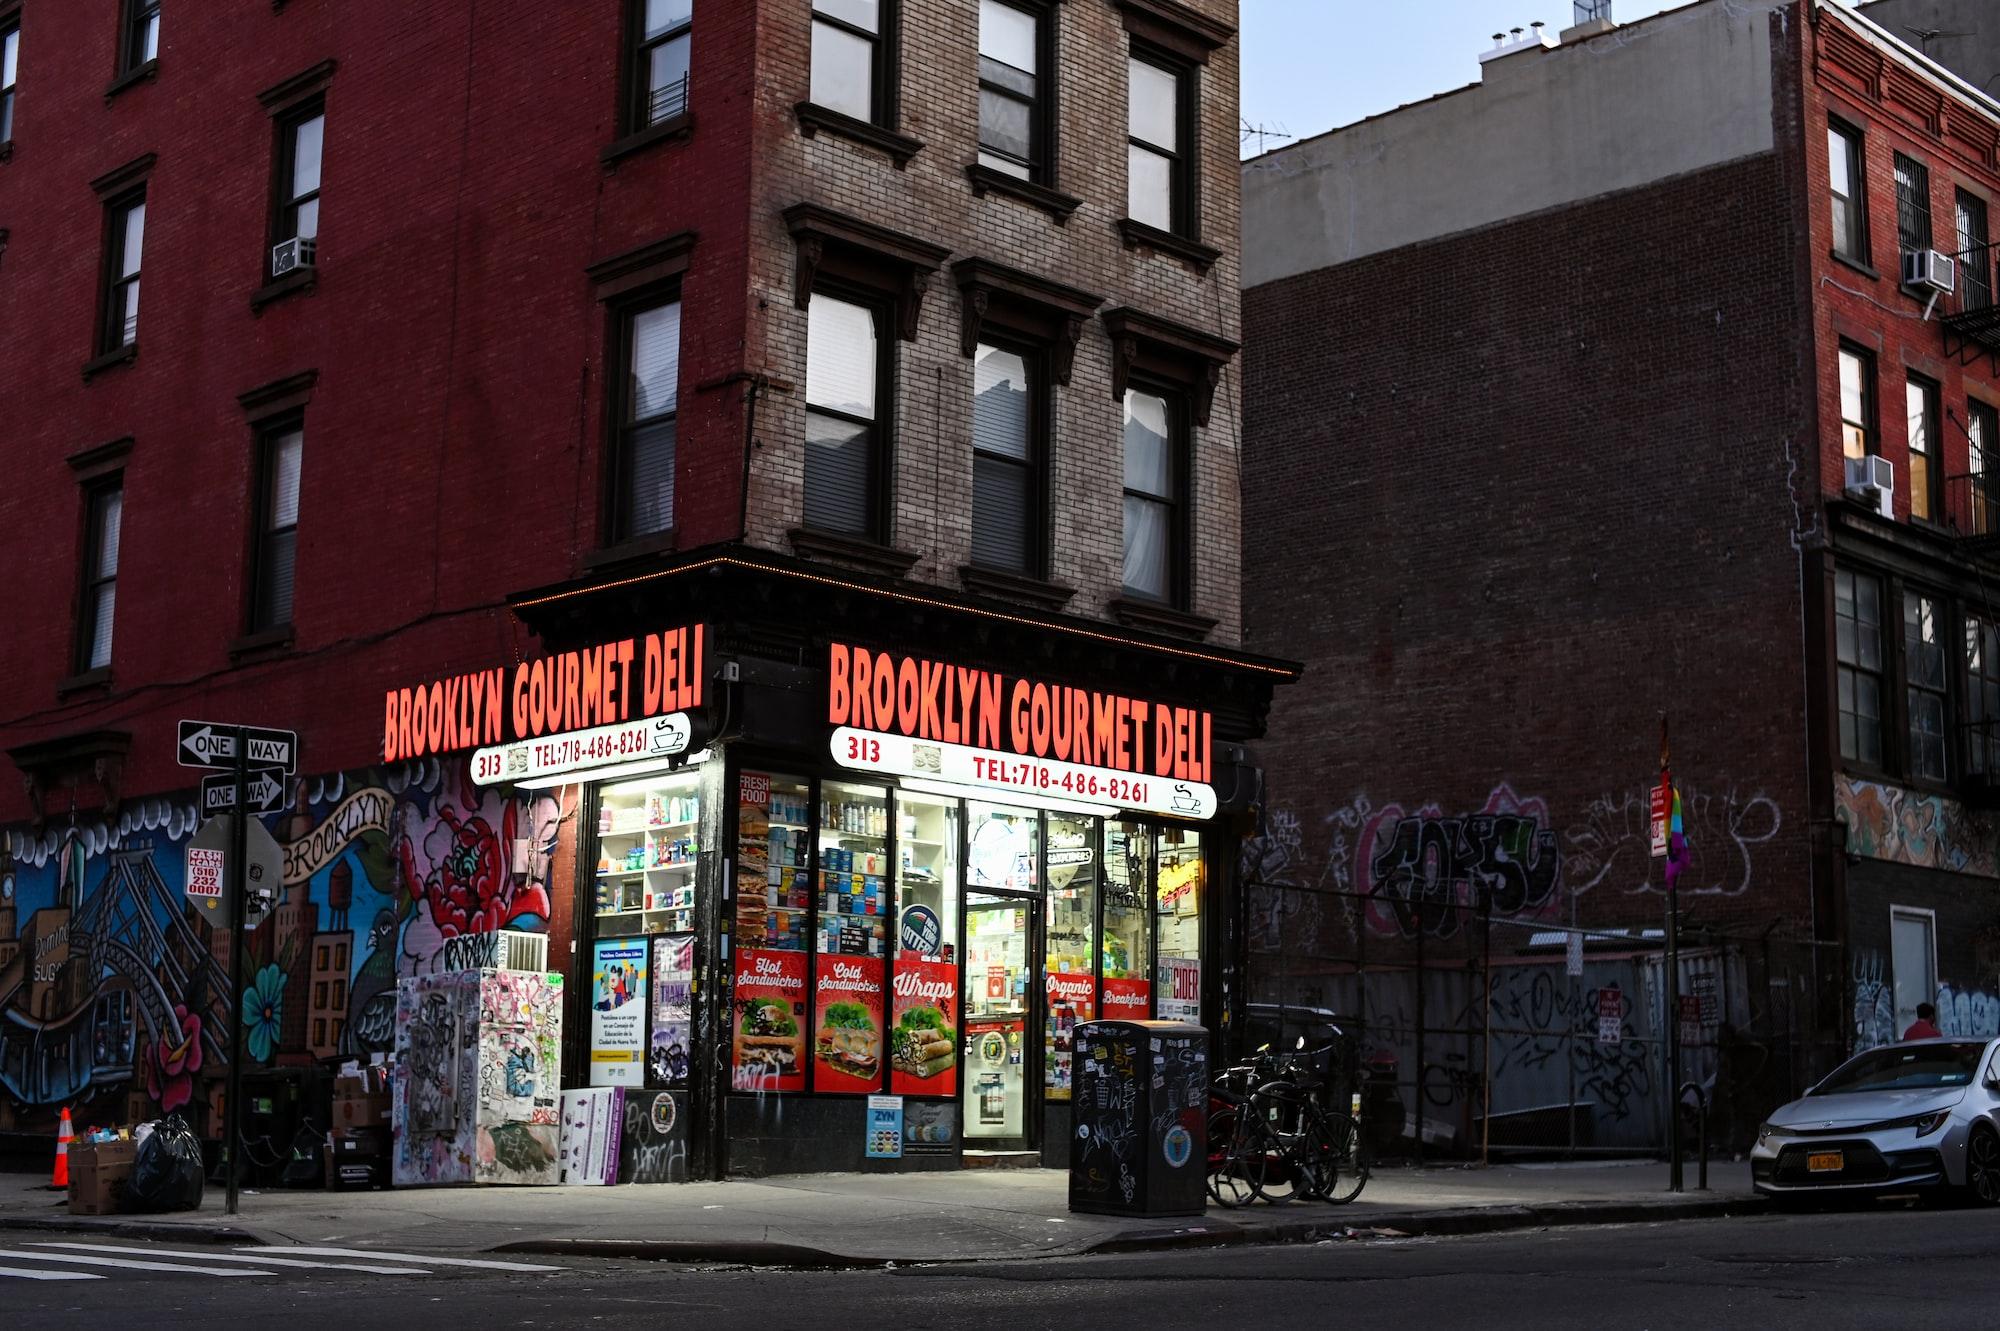 Bodega Brooklyn